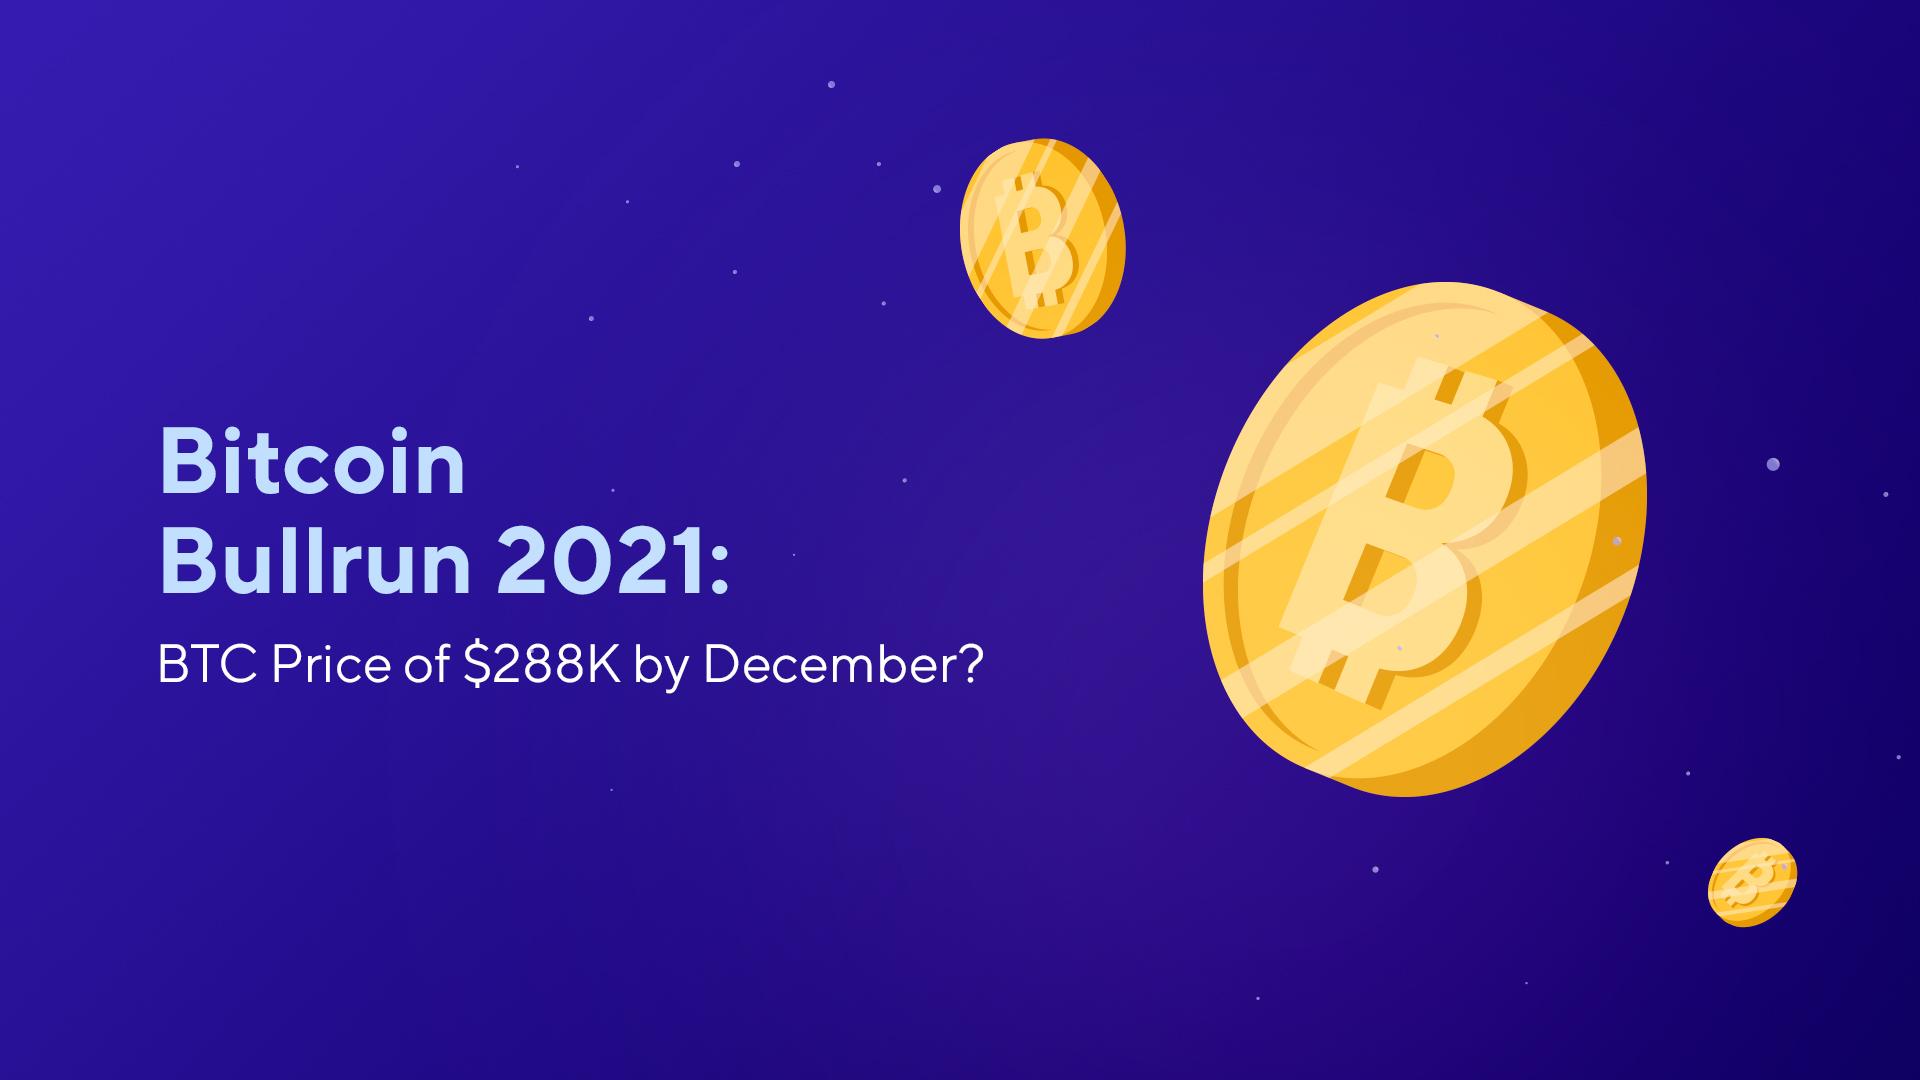 Bitcoin Bullrun 2021: BTC Price of $288K by December?